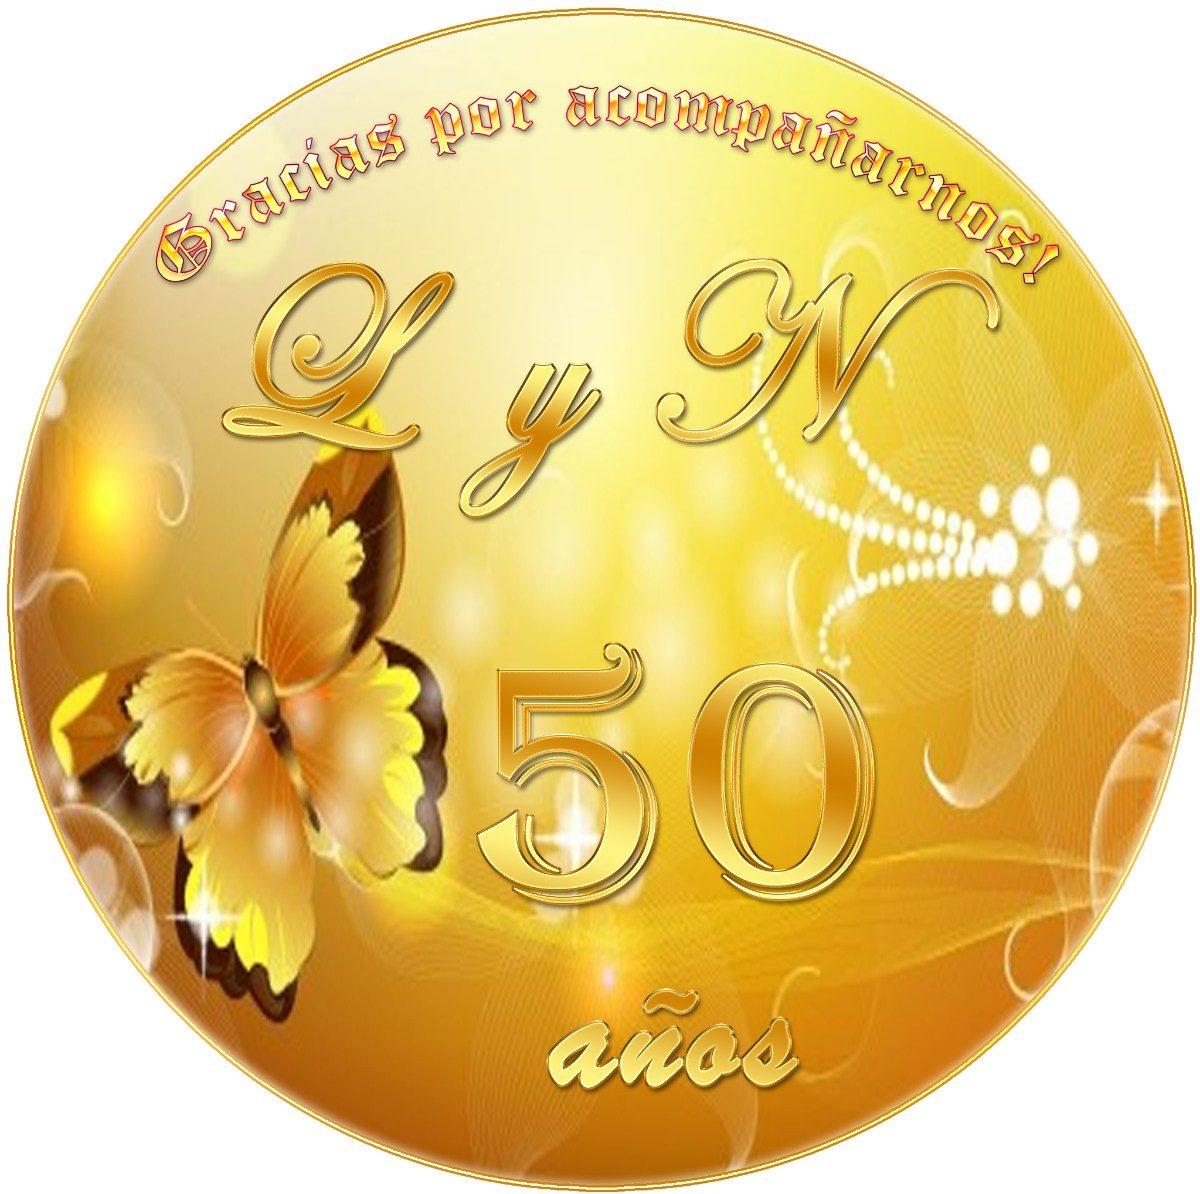 Kit Imprimible Aniversario Bodas Oro Fiesta Temática - $ 39,19 en ...